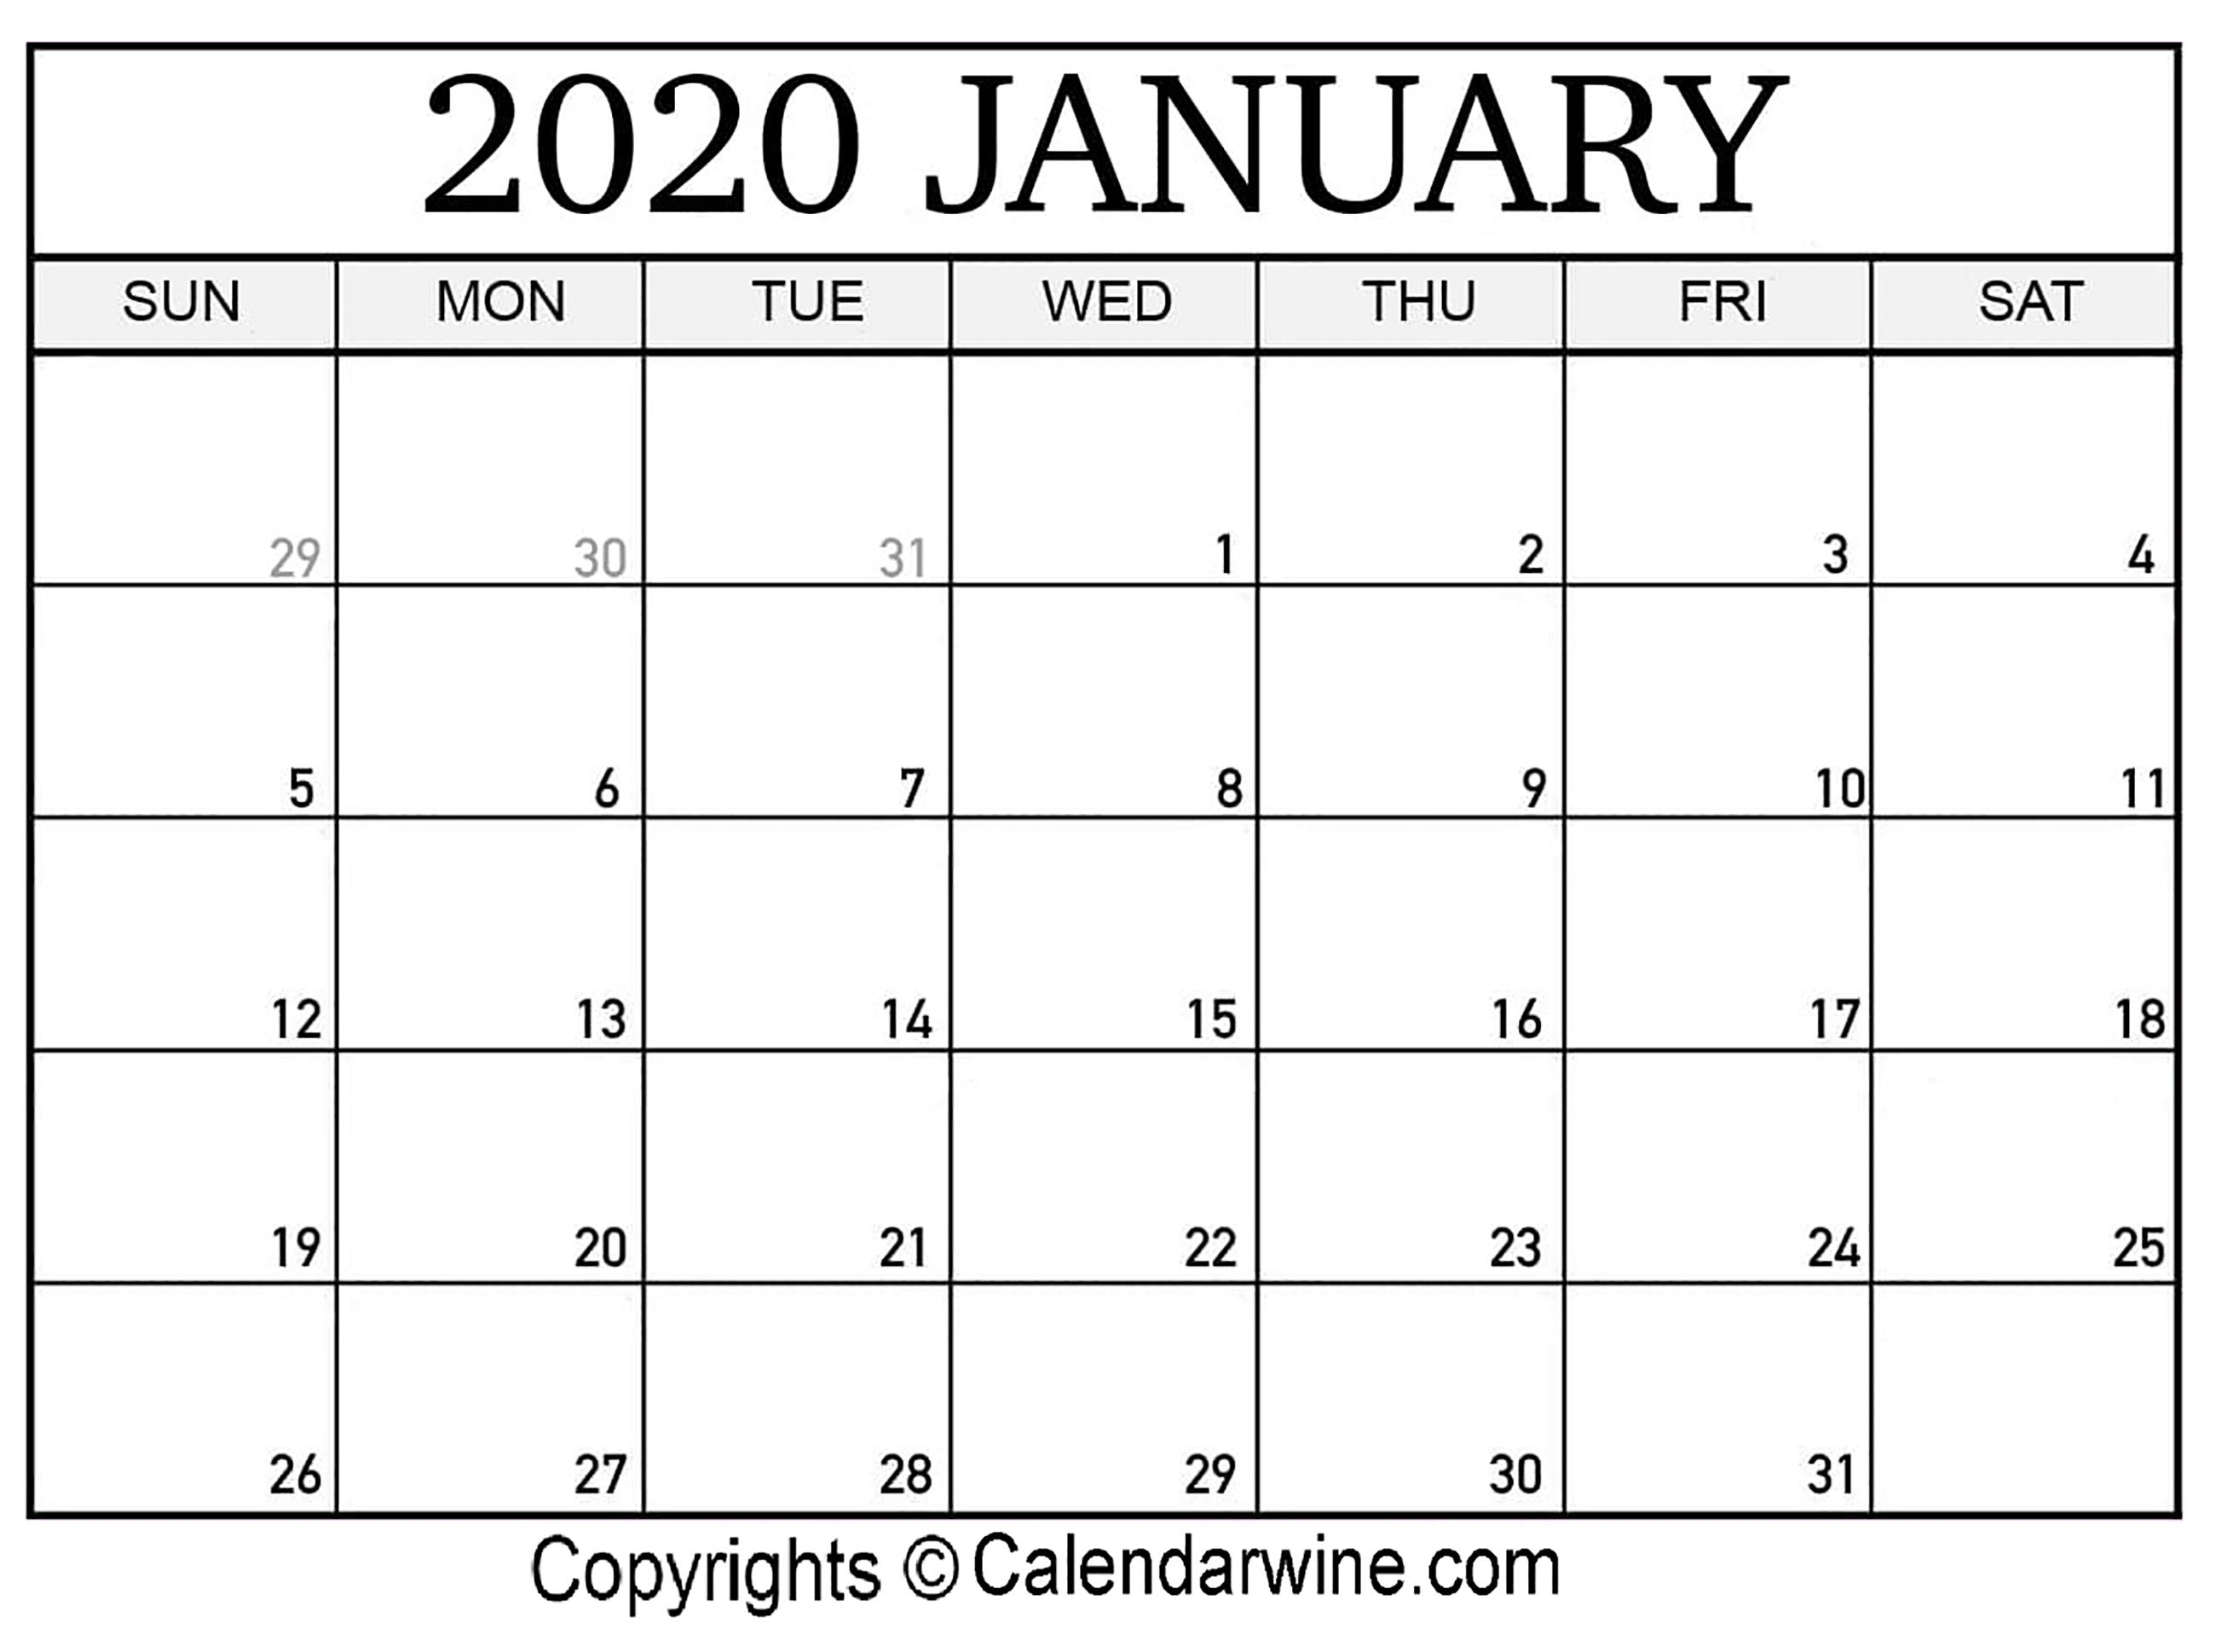 January 2020 Printable Calendar Templates | Calendar Wine inside January 2020 Calendar